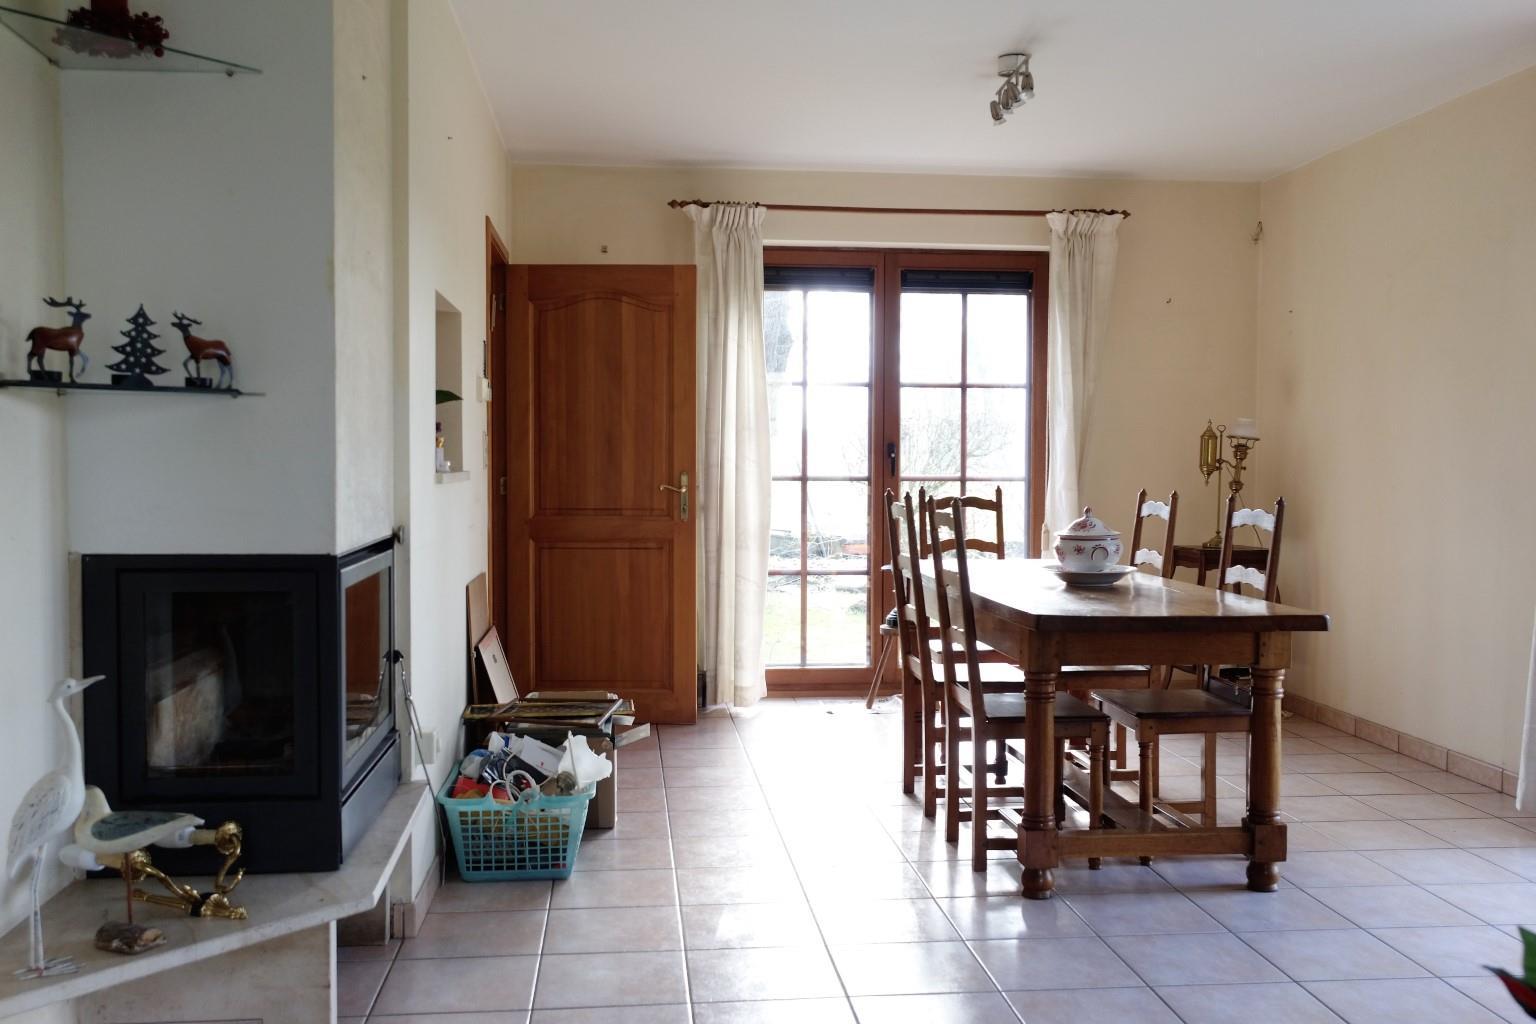 Villa - Braine-le-Comte Petit-Roeulxlez-Braine - #3029346-2